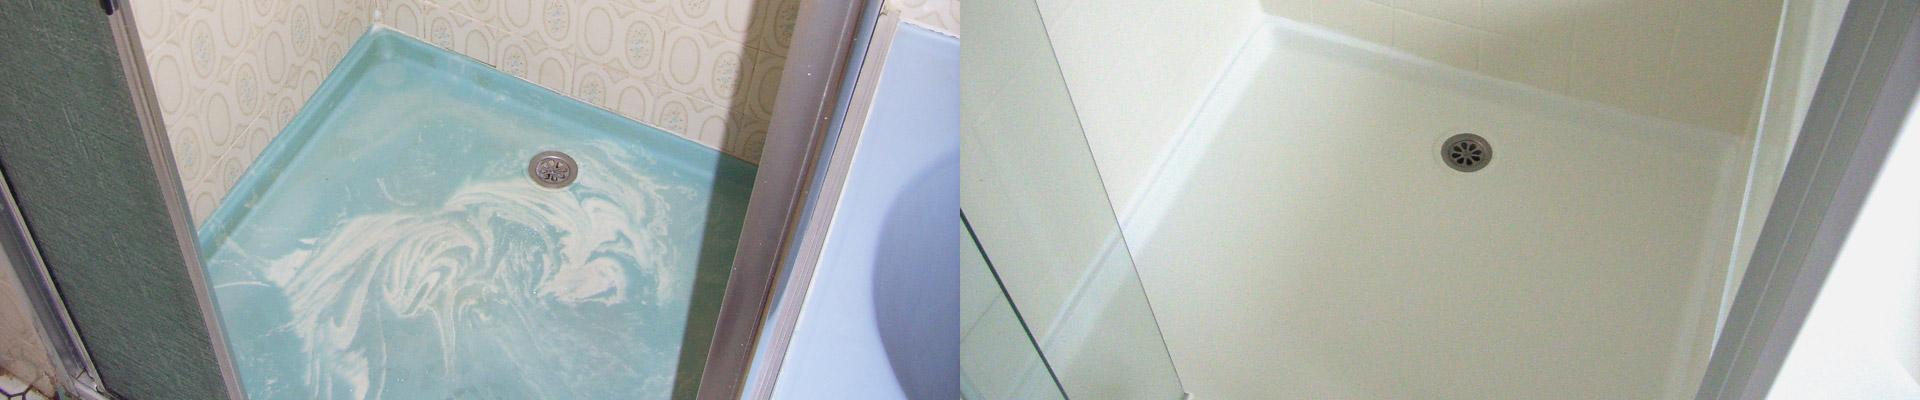 New 90+ Bathroom Tiles Resurfacing Inspiration Of Resurfacing ...